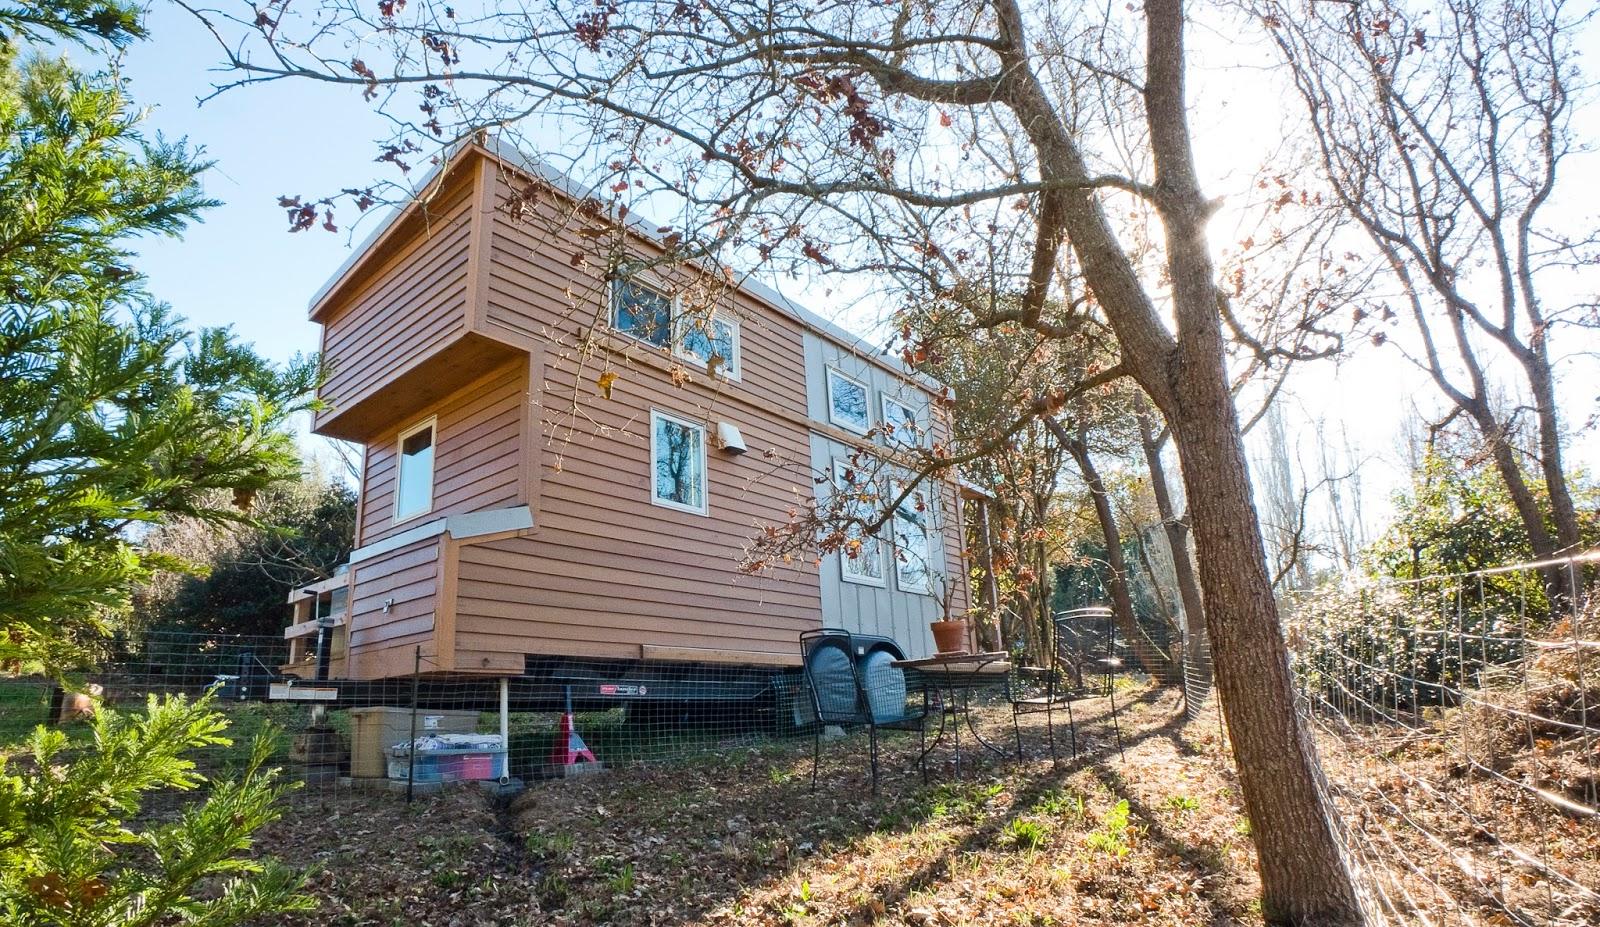 Pleasant Lloyds Blog A California Couple Built This Portable Tiny House Largest Home Design Picture Inspirations Pitcheantrous